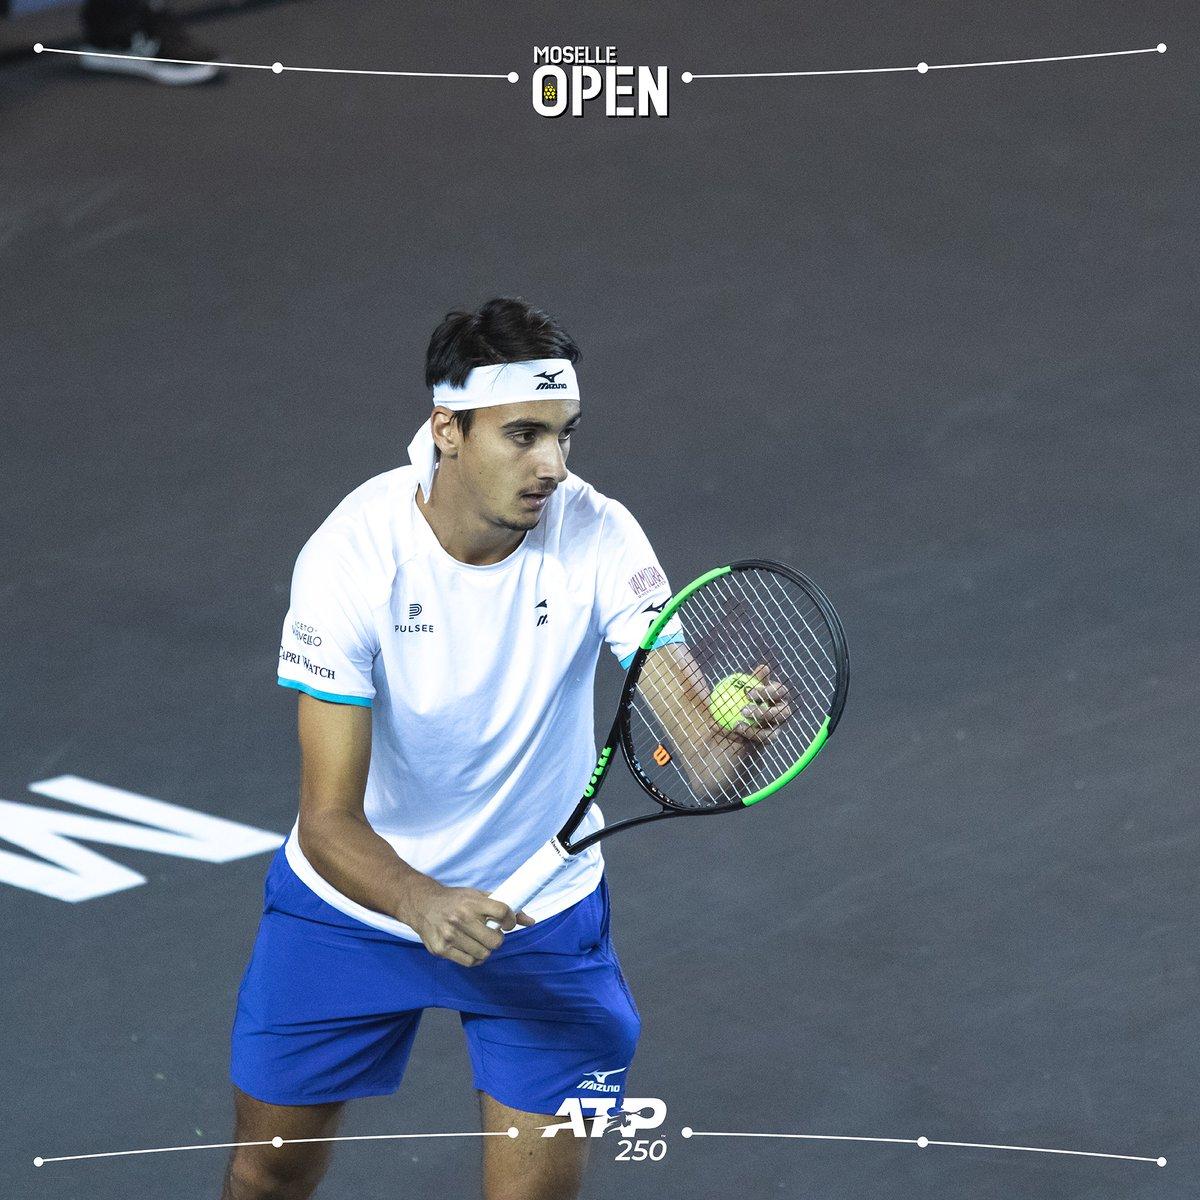 ATP 250 Metz- Esordio positivo per Sonego e per Tsonga